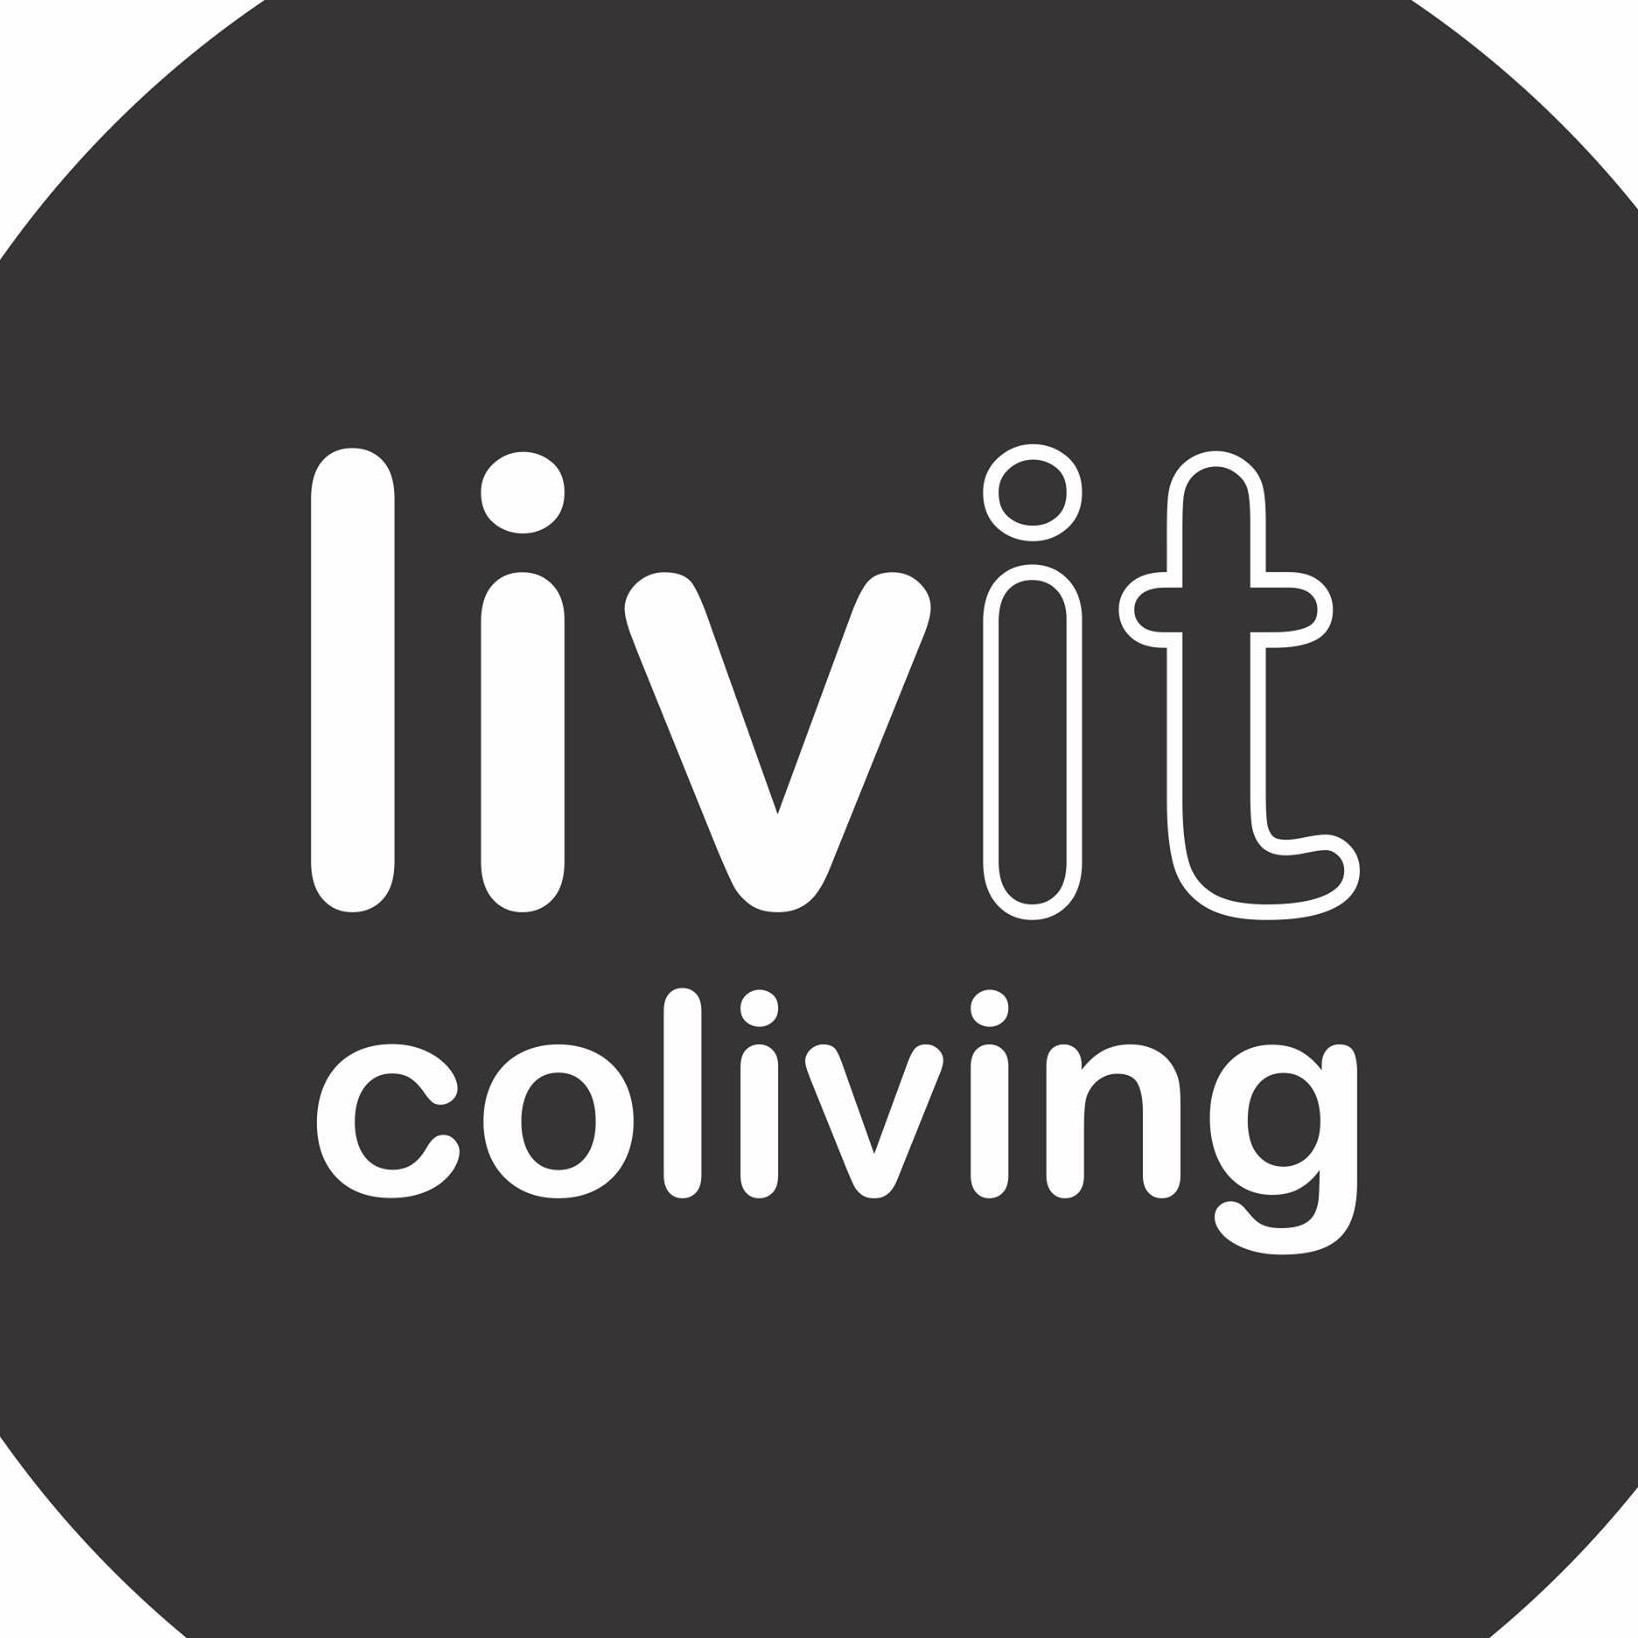 Livit Mexico Coliving Company